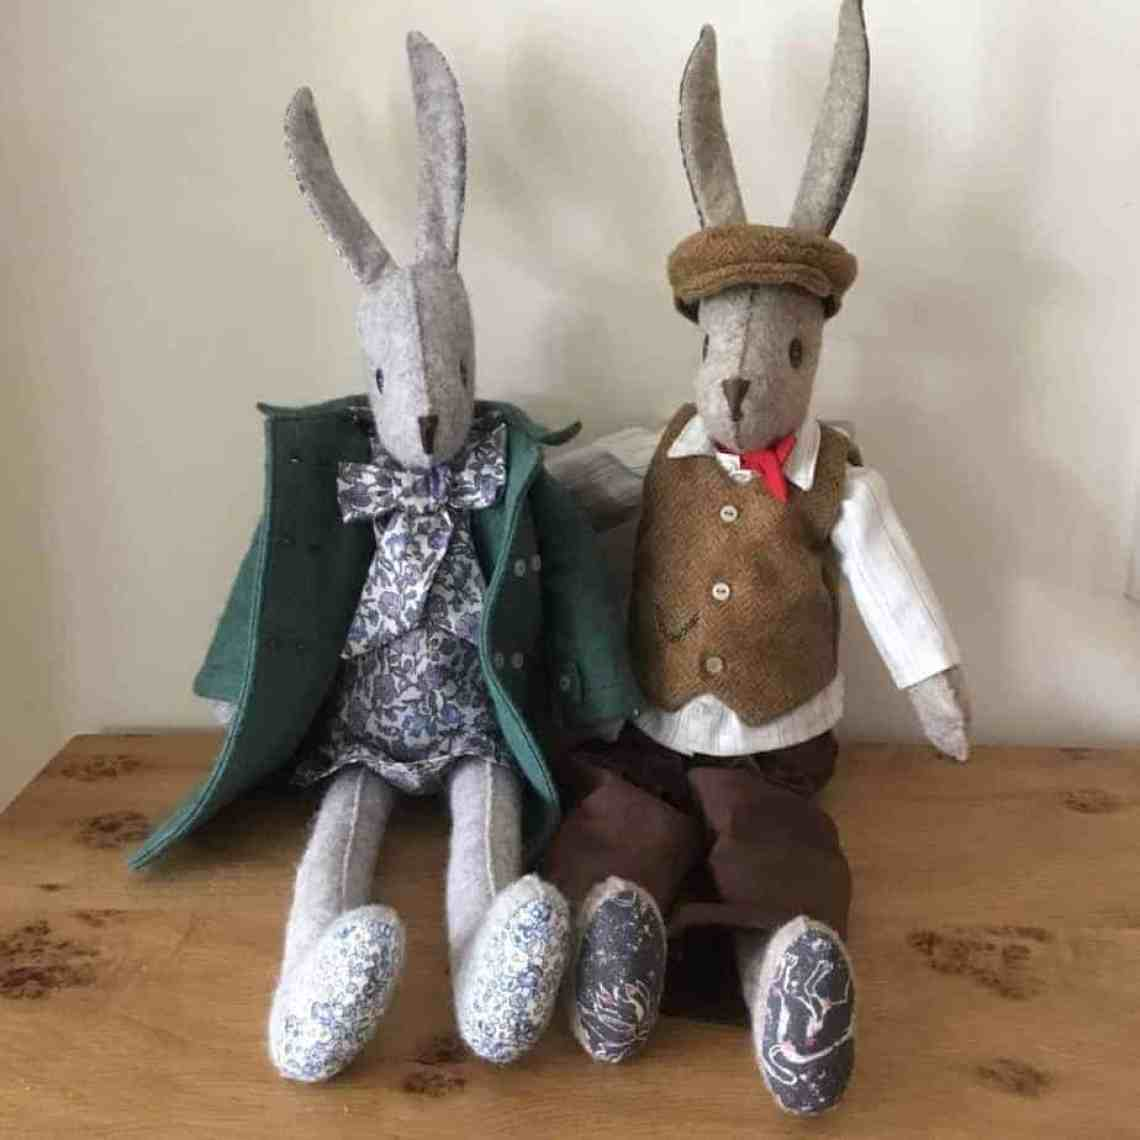 Luna Rabbit and Alfie Rabbit by fabricandflowers | Sonia Spence